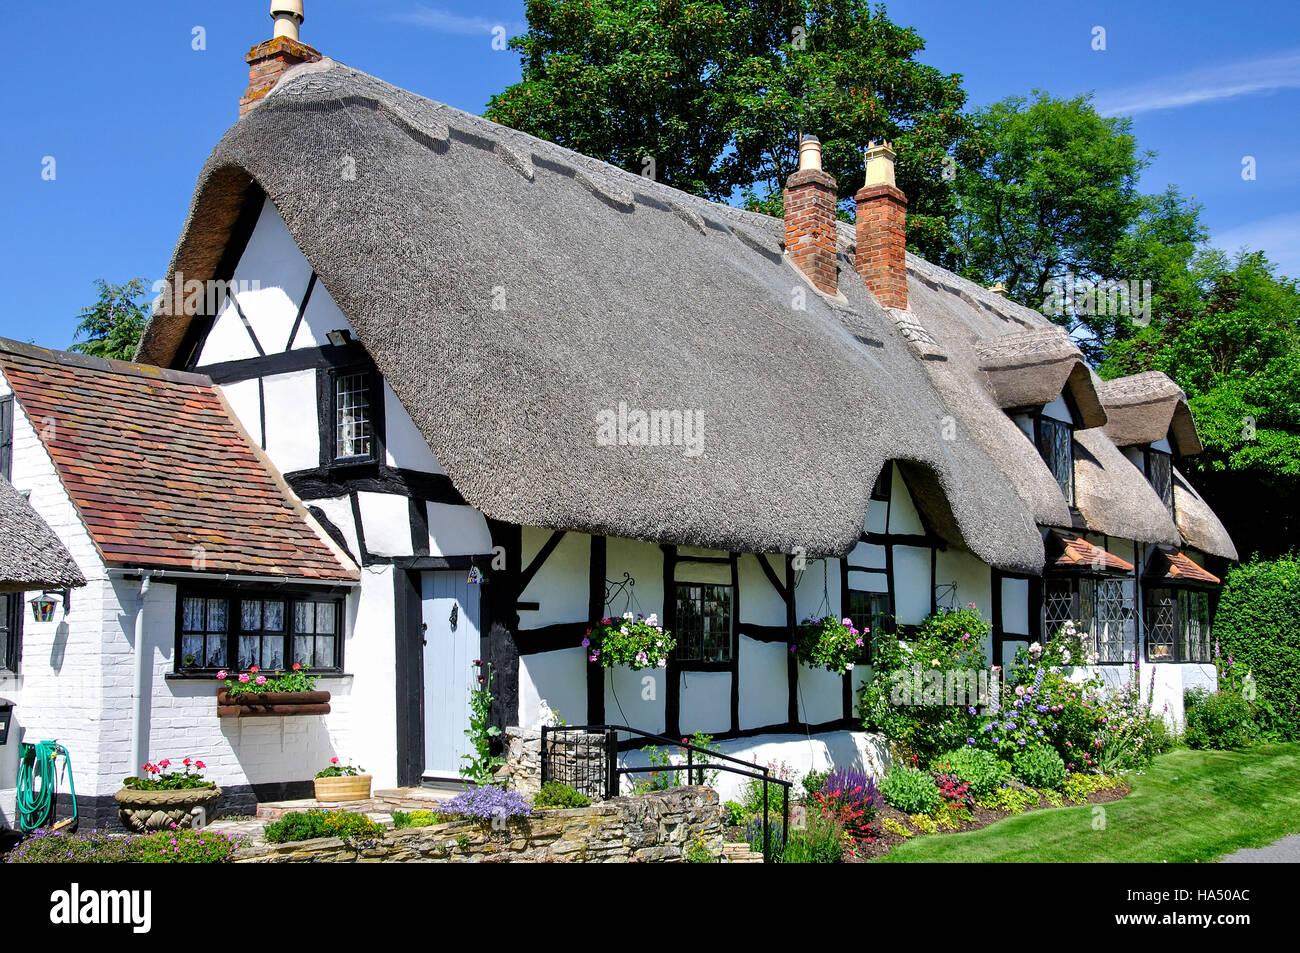 Thatched cottage, Welford-on-Avon, Warwickshire, England, United Kingdom - Stock Image